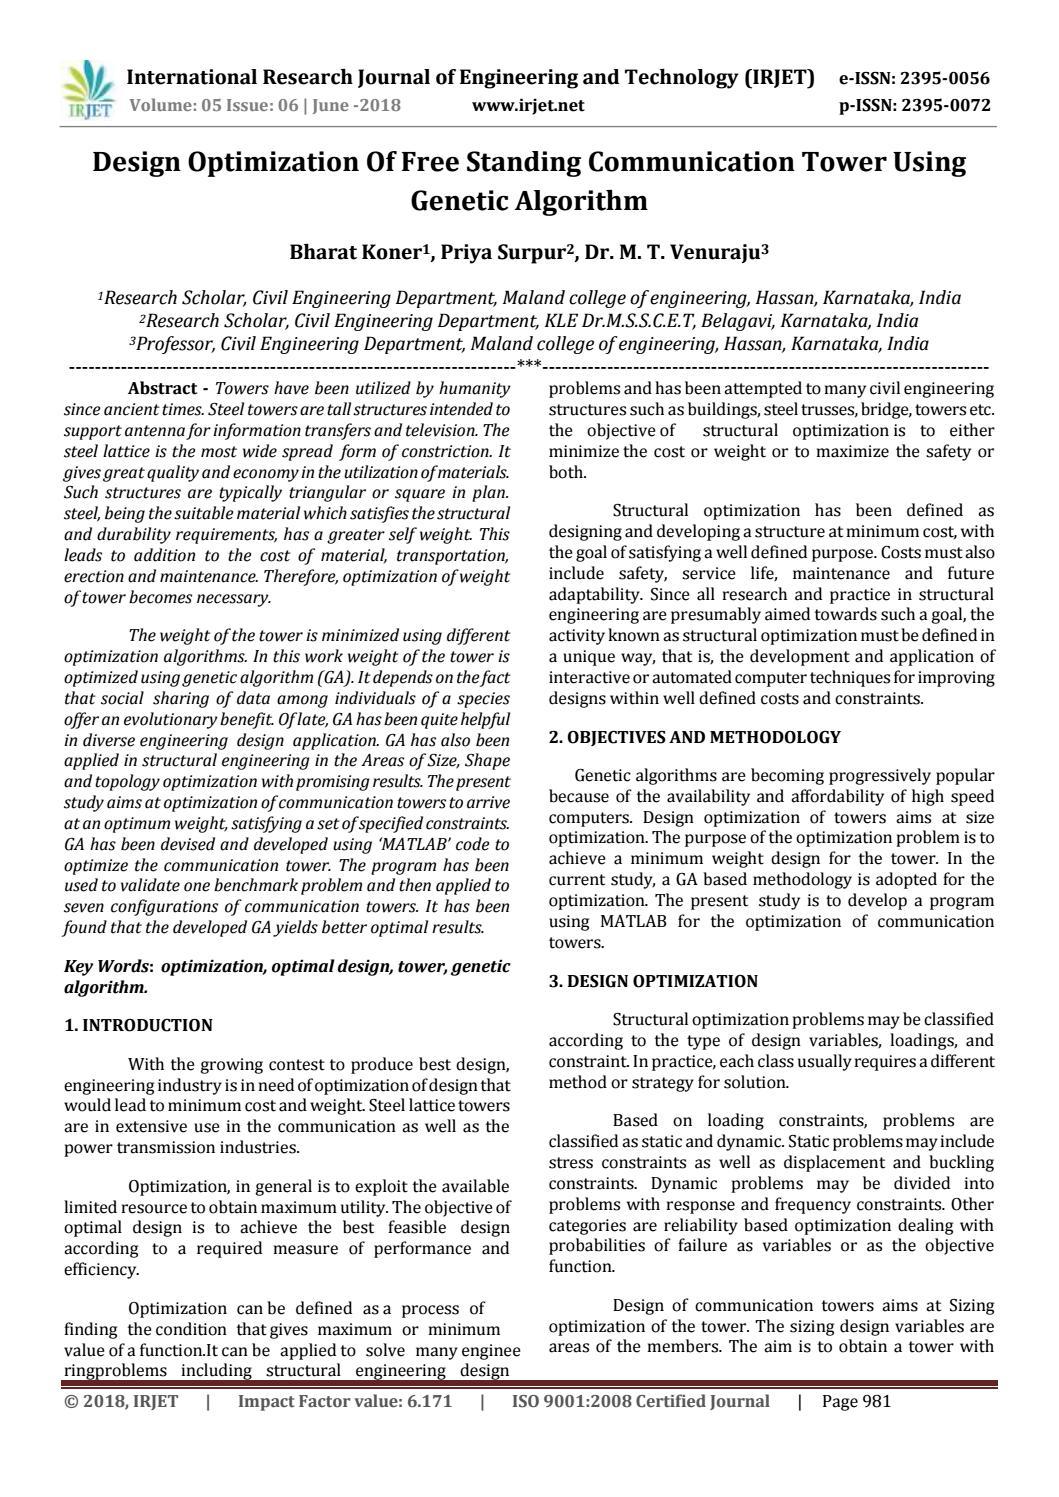 IRJET-Design Optimization of Free Standing Communication Tower using